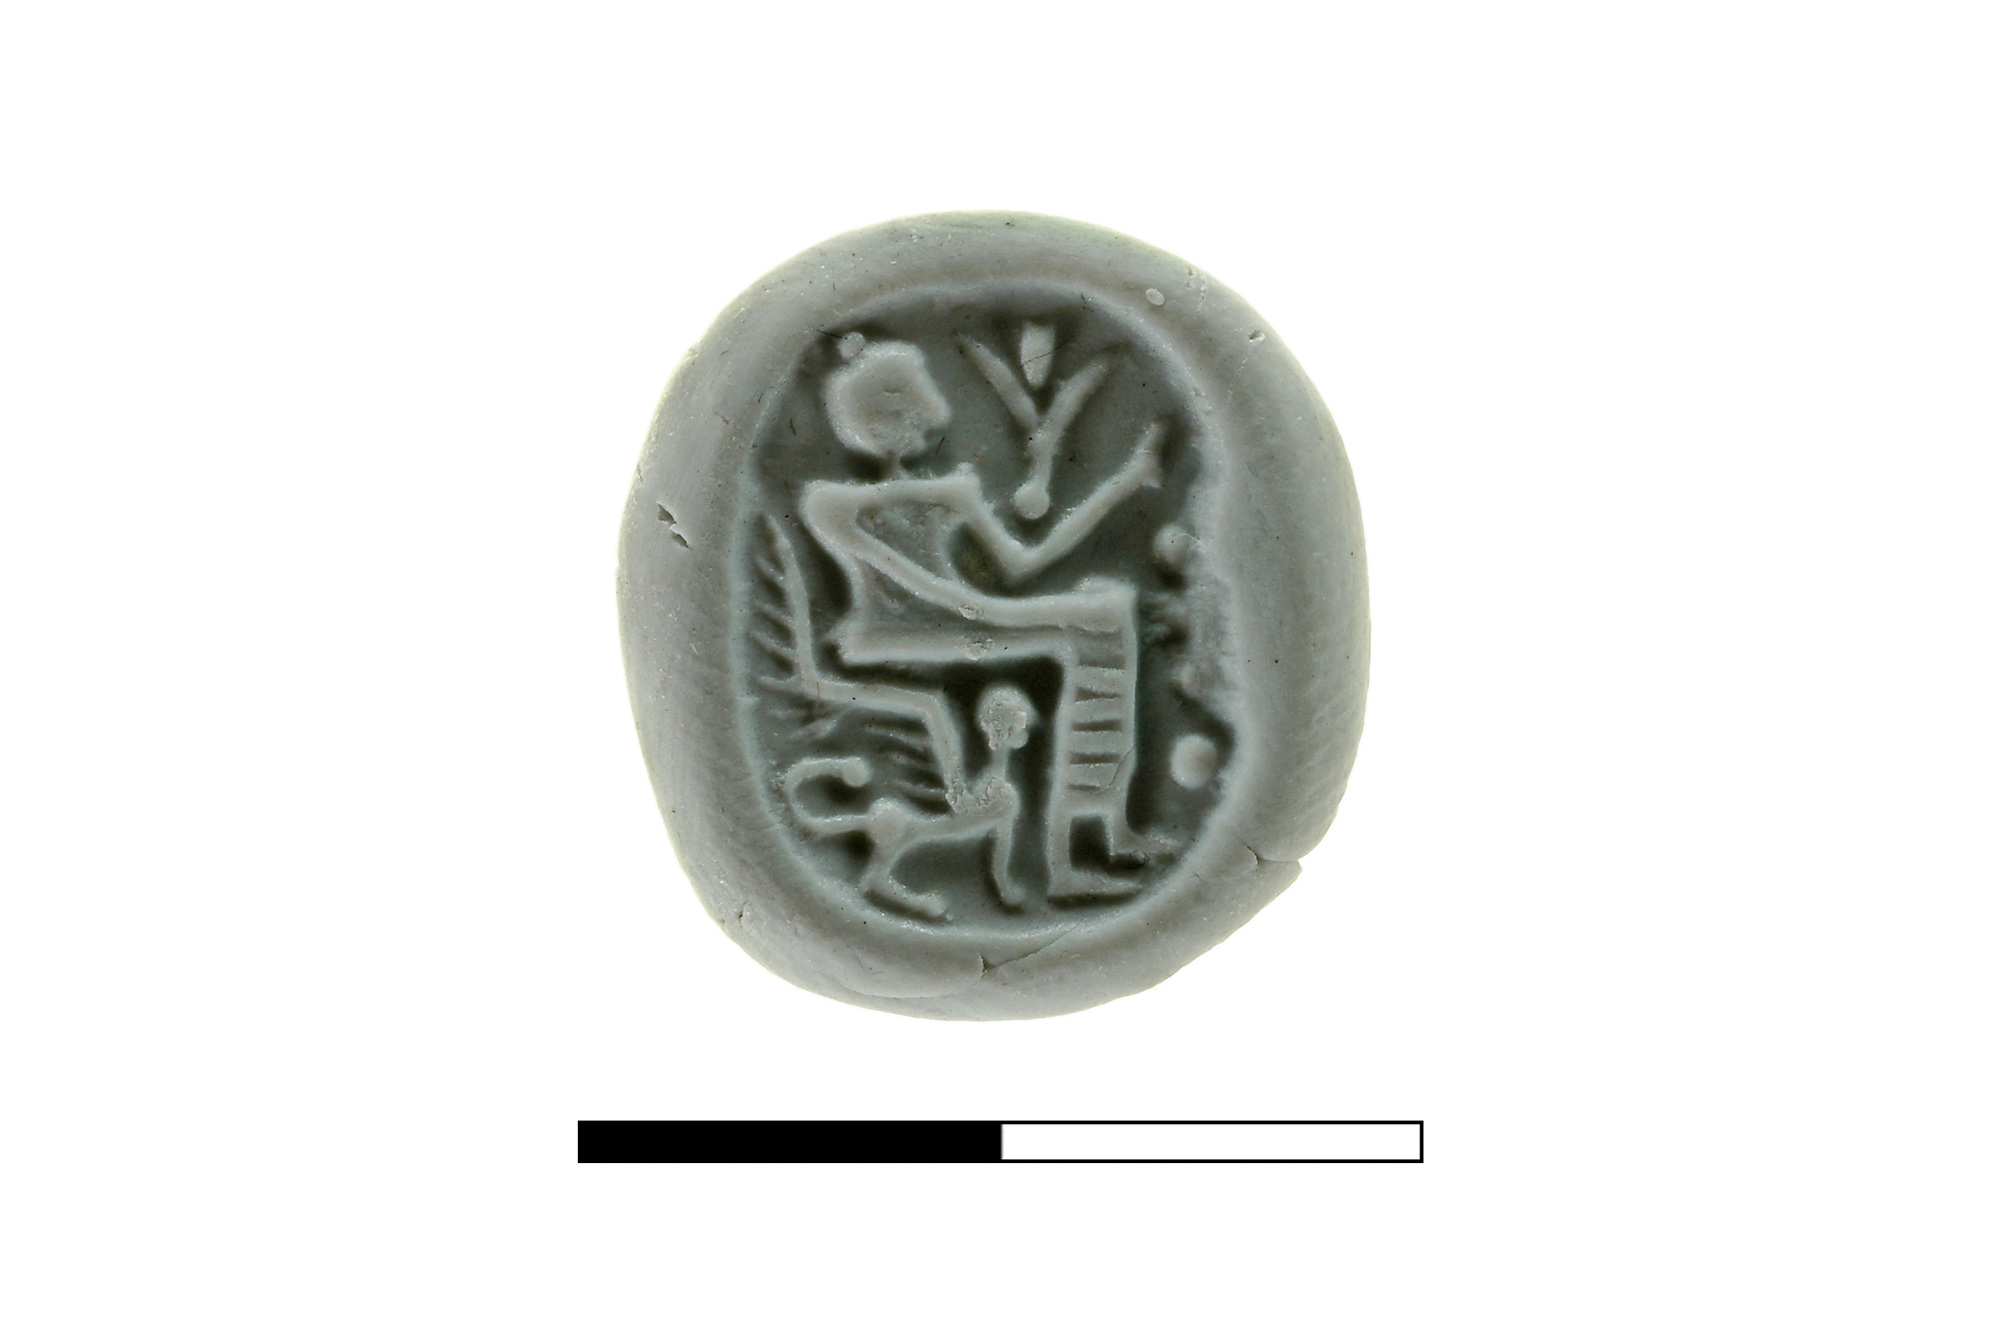 An Iron Age seal impression